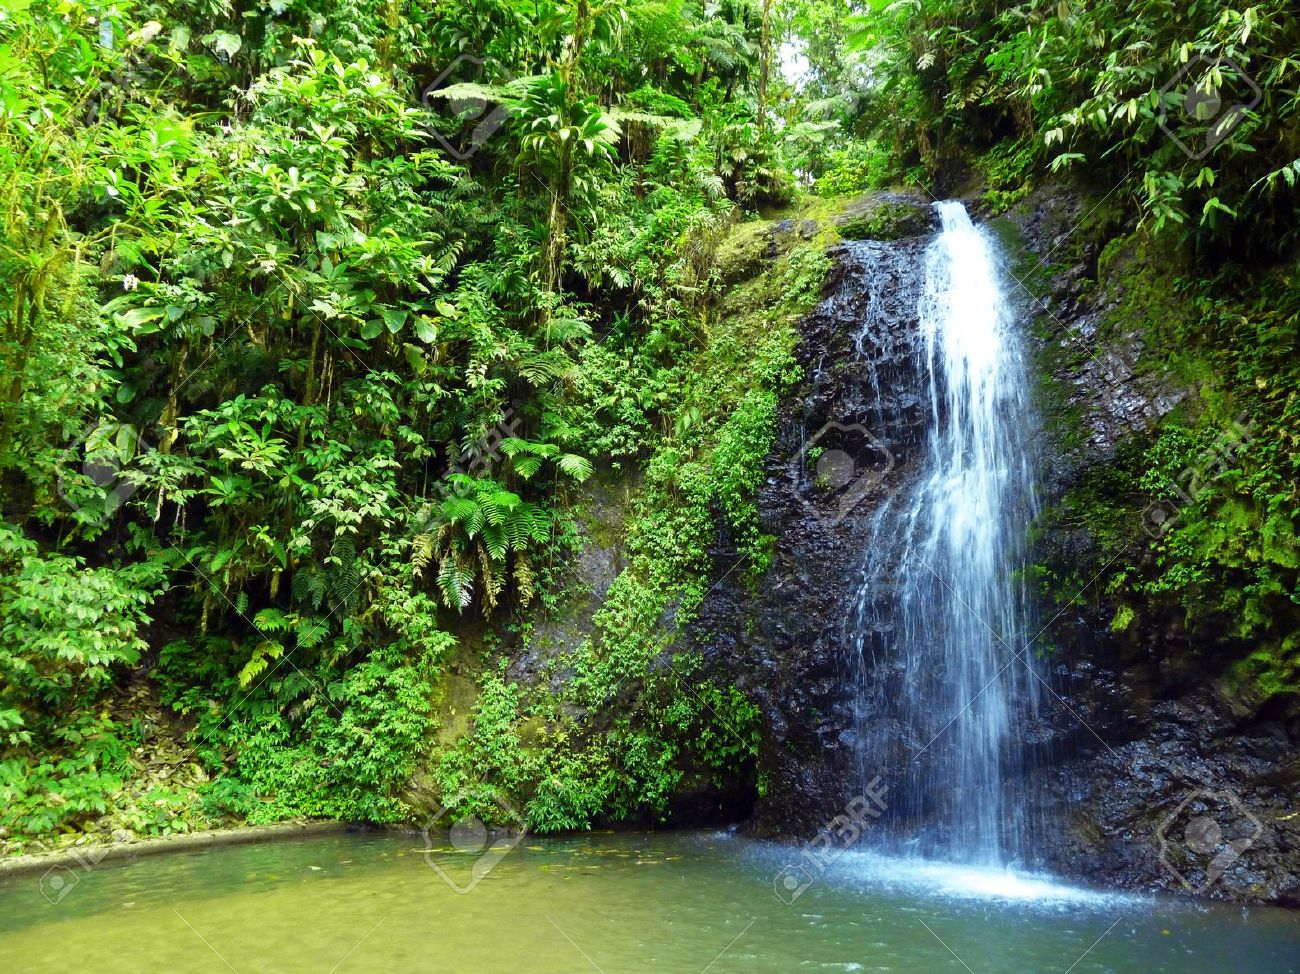 Exotic Waterfalls on Rainforest Nature Stock Photo - 13896014